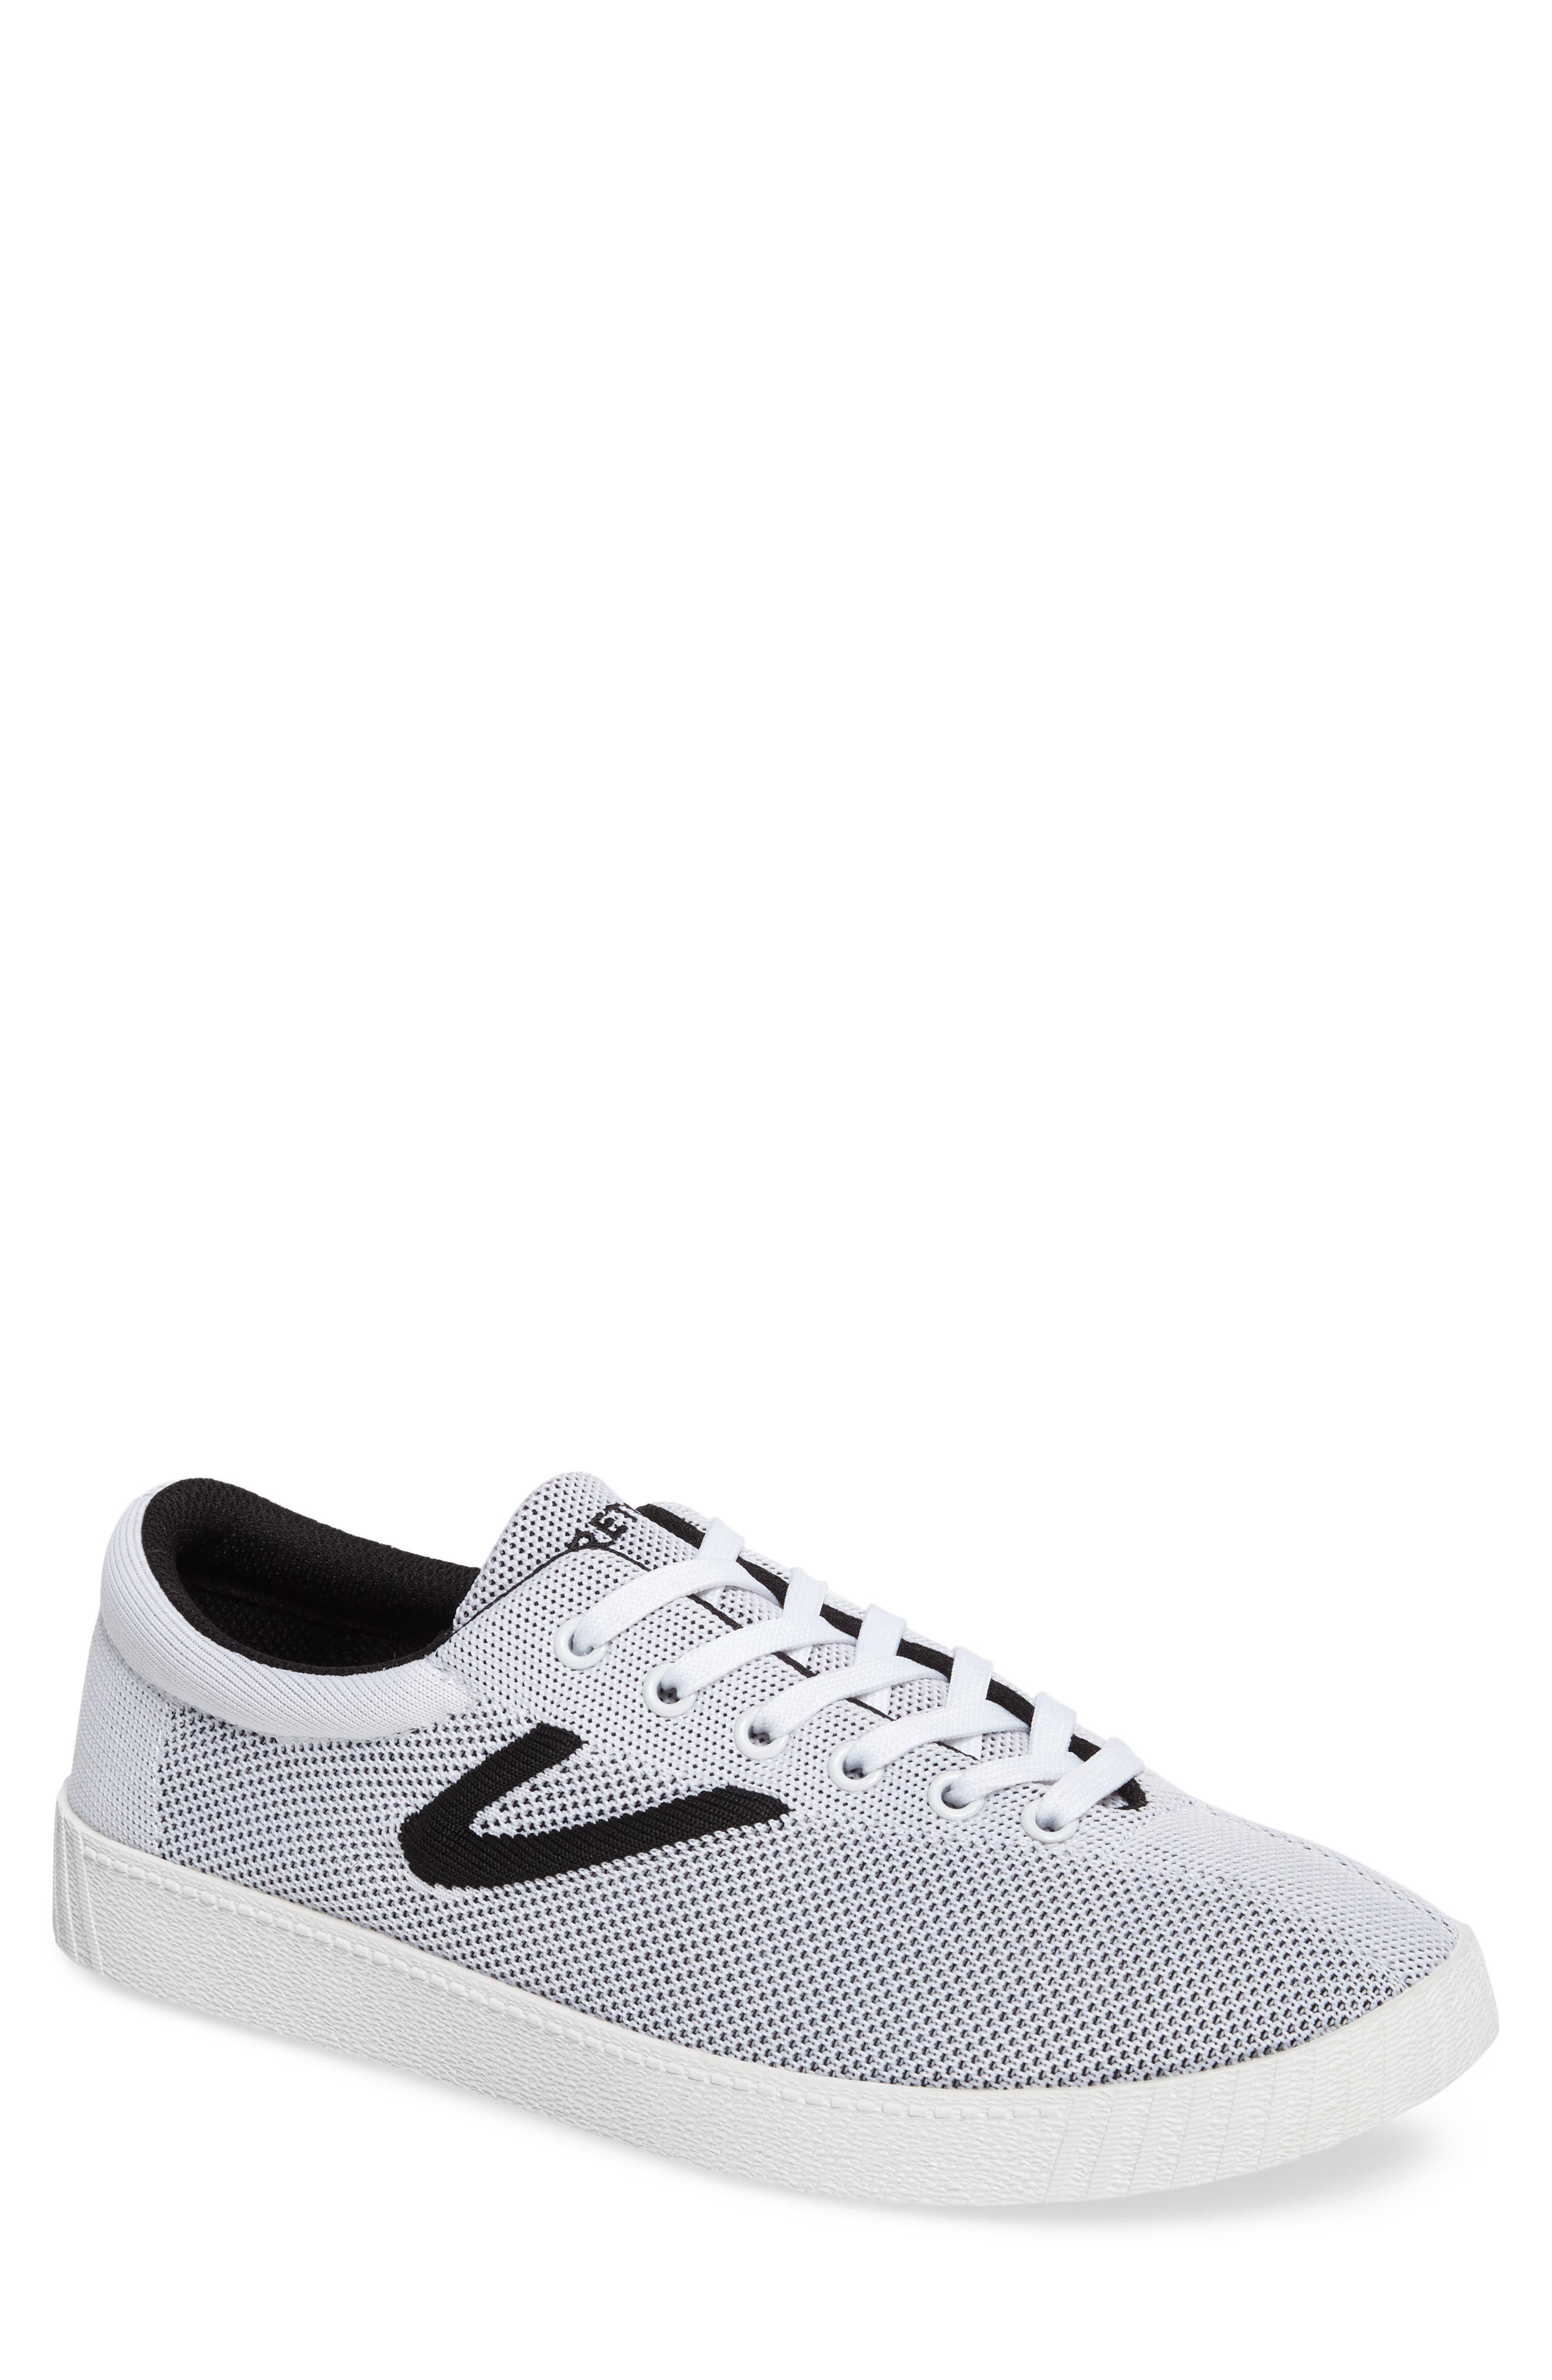 Main Image - Tretorn Nylite Knit Sneaker (Men)